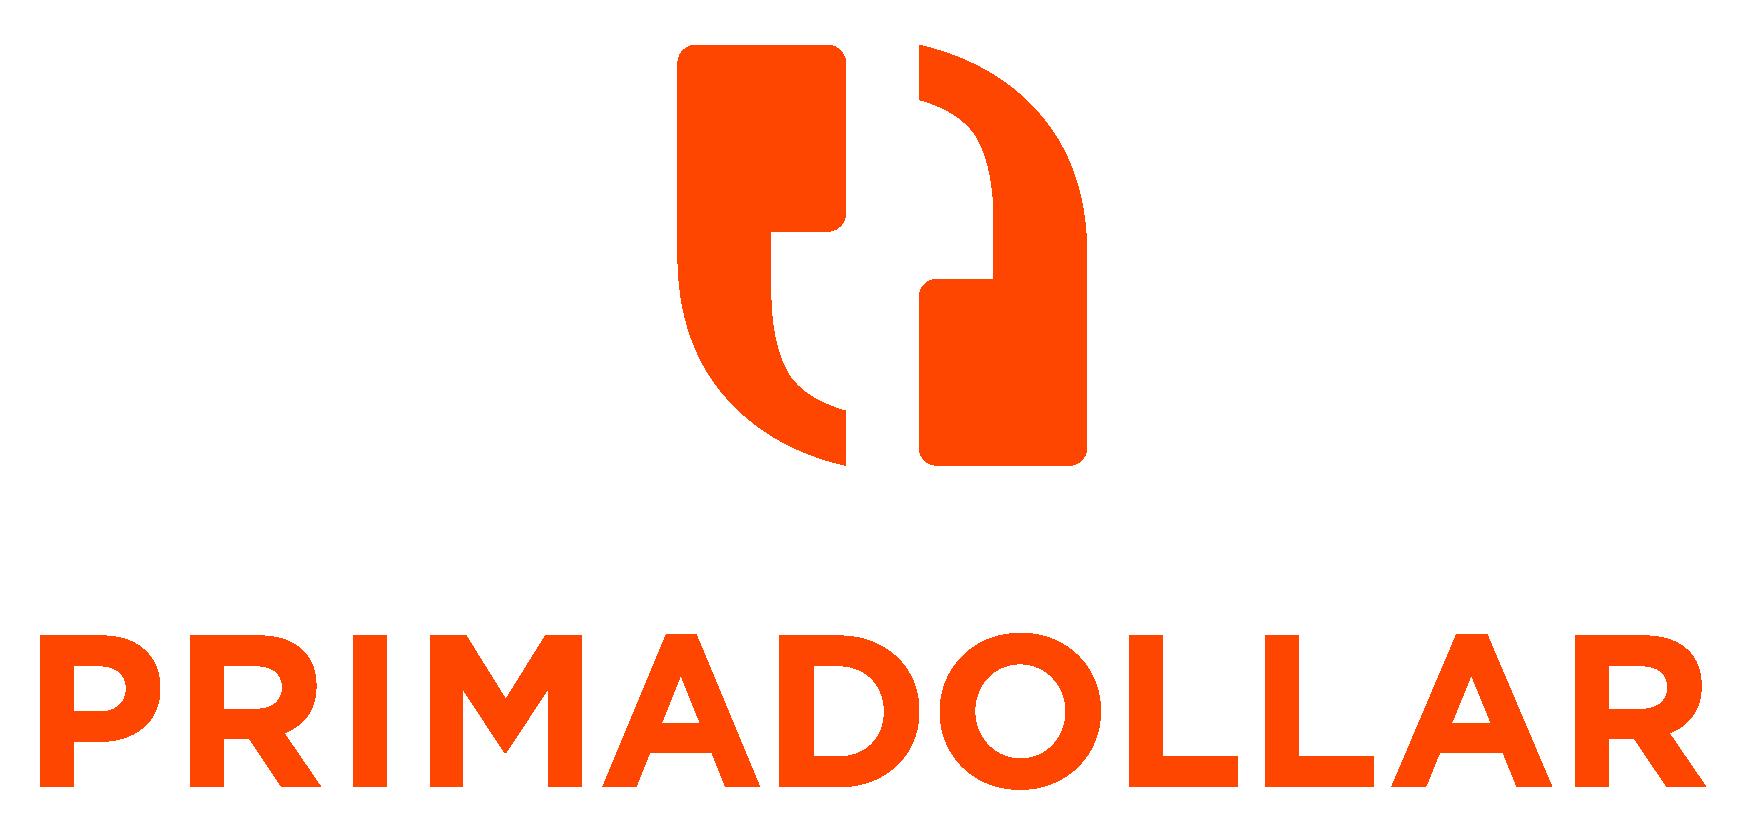 PrimaDollar logo